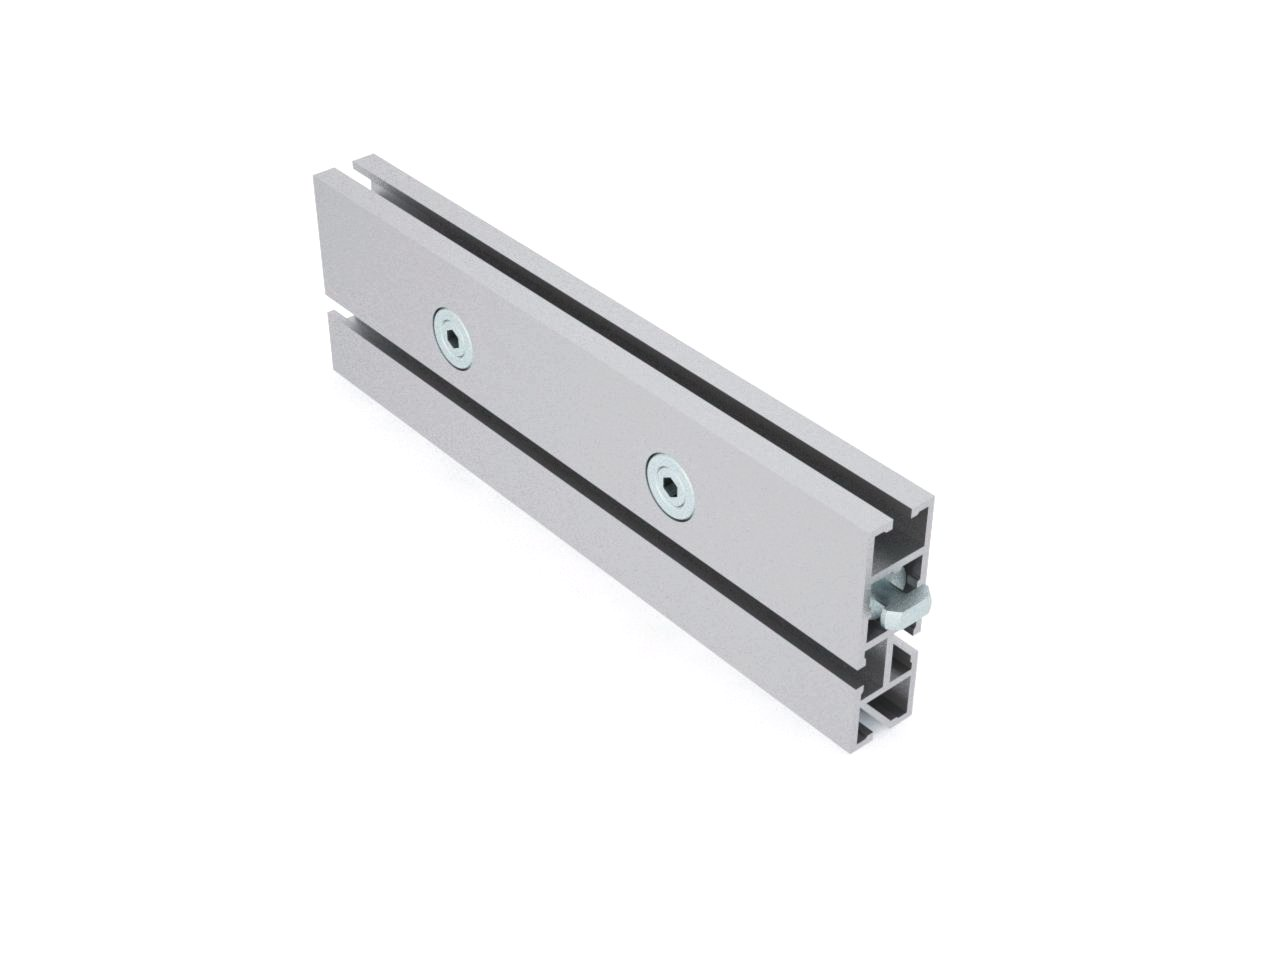 T500L perfil travessa alumínio montagem stands estruturas octanorm Z400 Z460